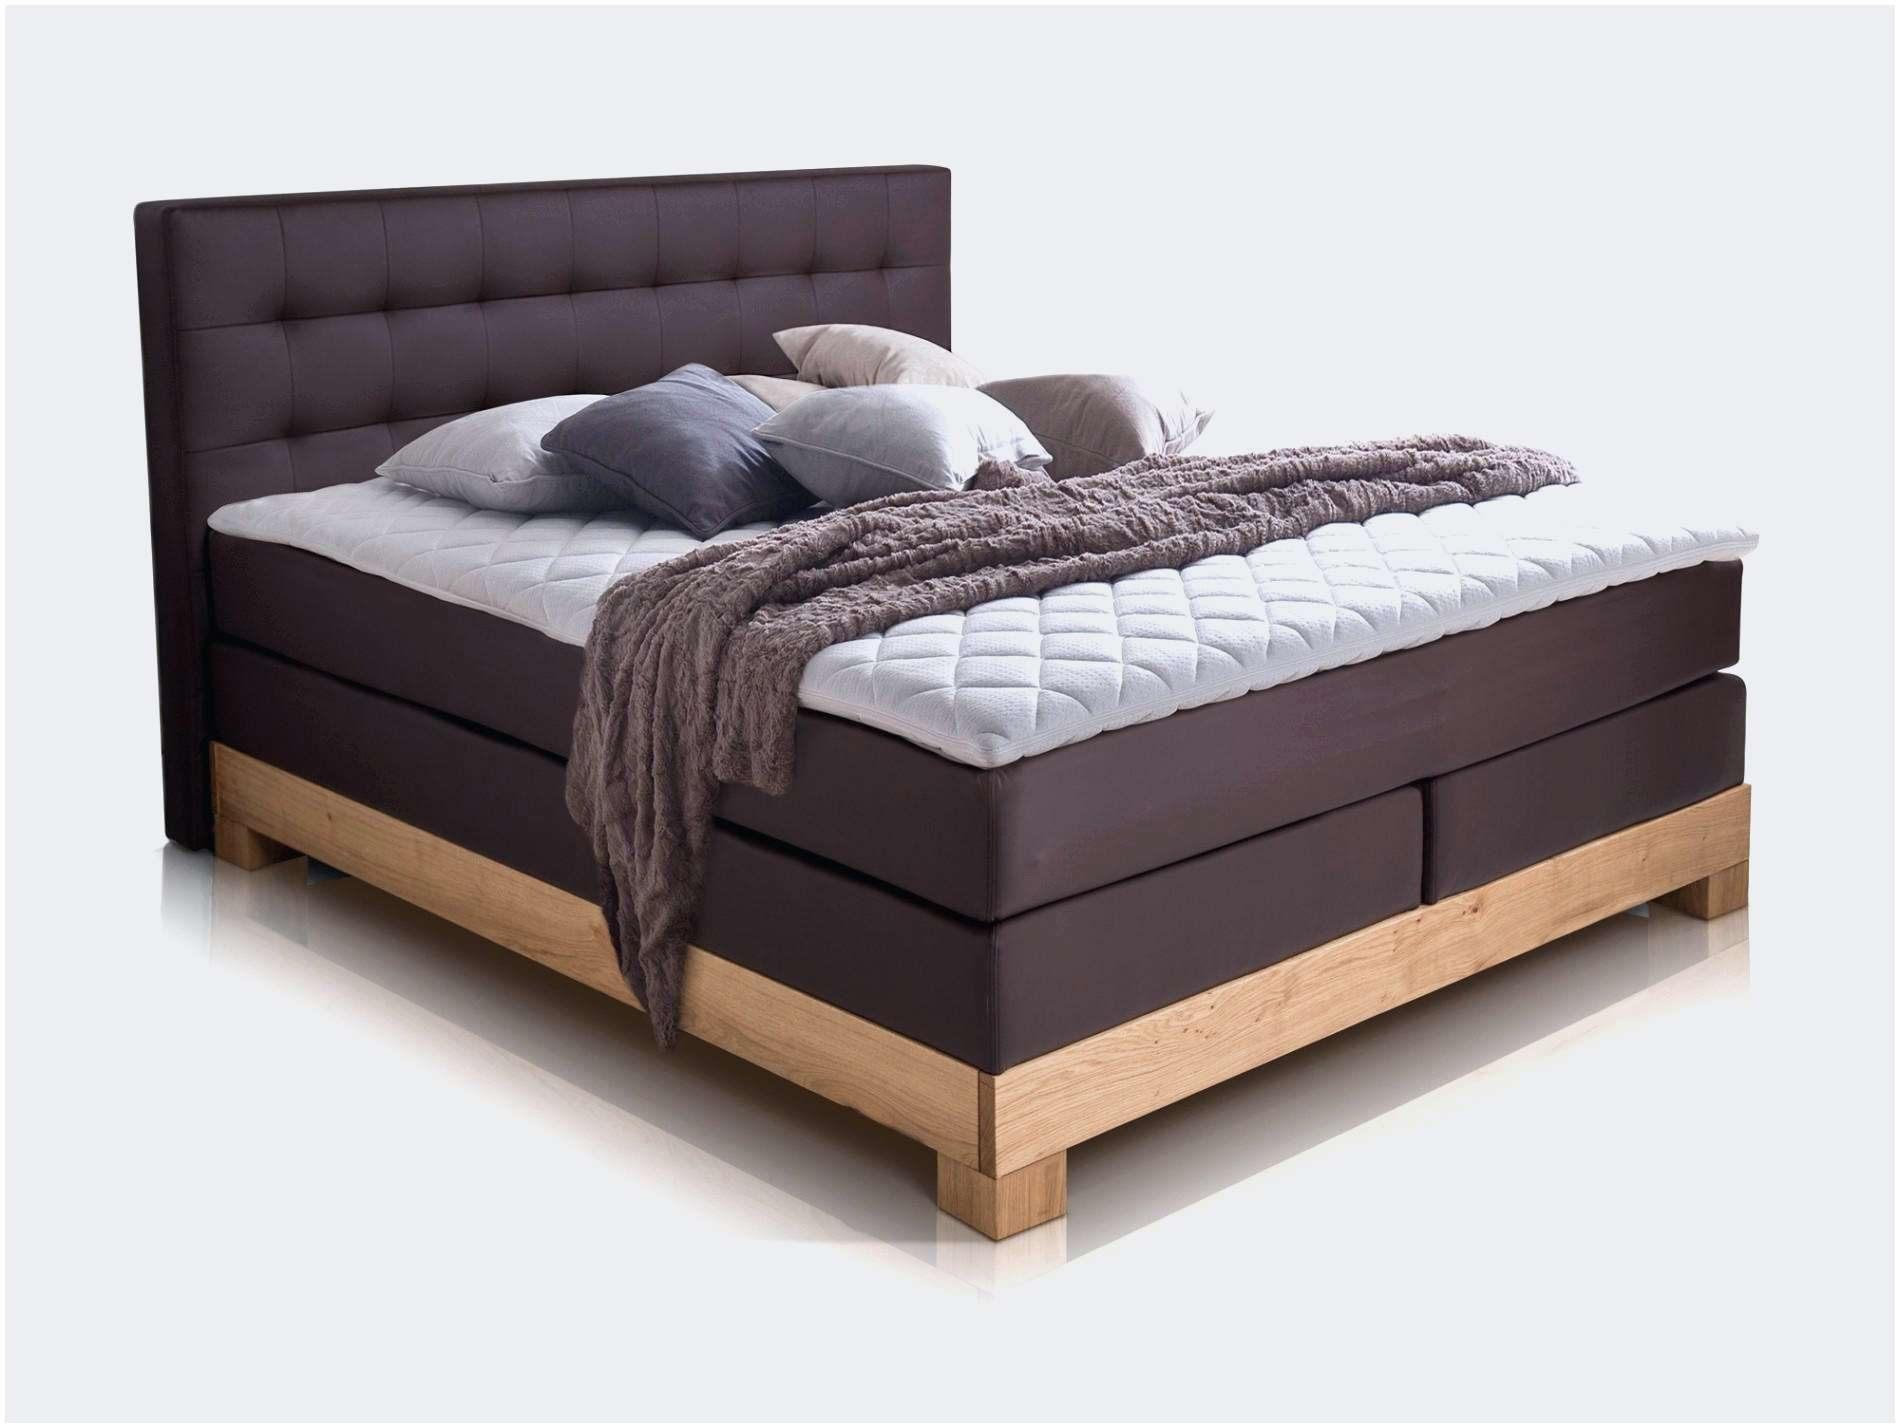 Lit 140×190 Ikea Magnifique Luxe Ikea Matras Sultan Inspirerende Matelas 160—200 Ikea Elegant